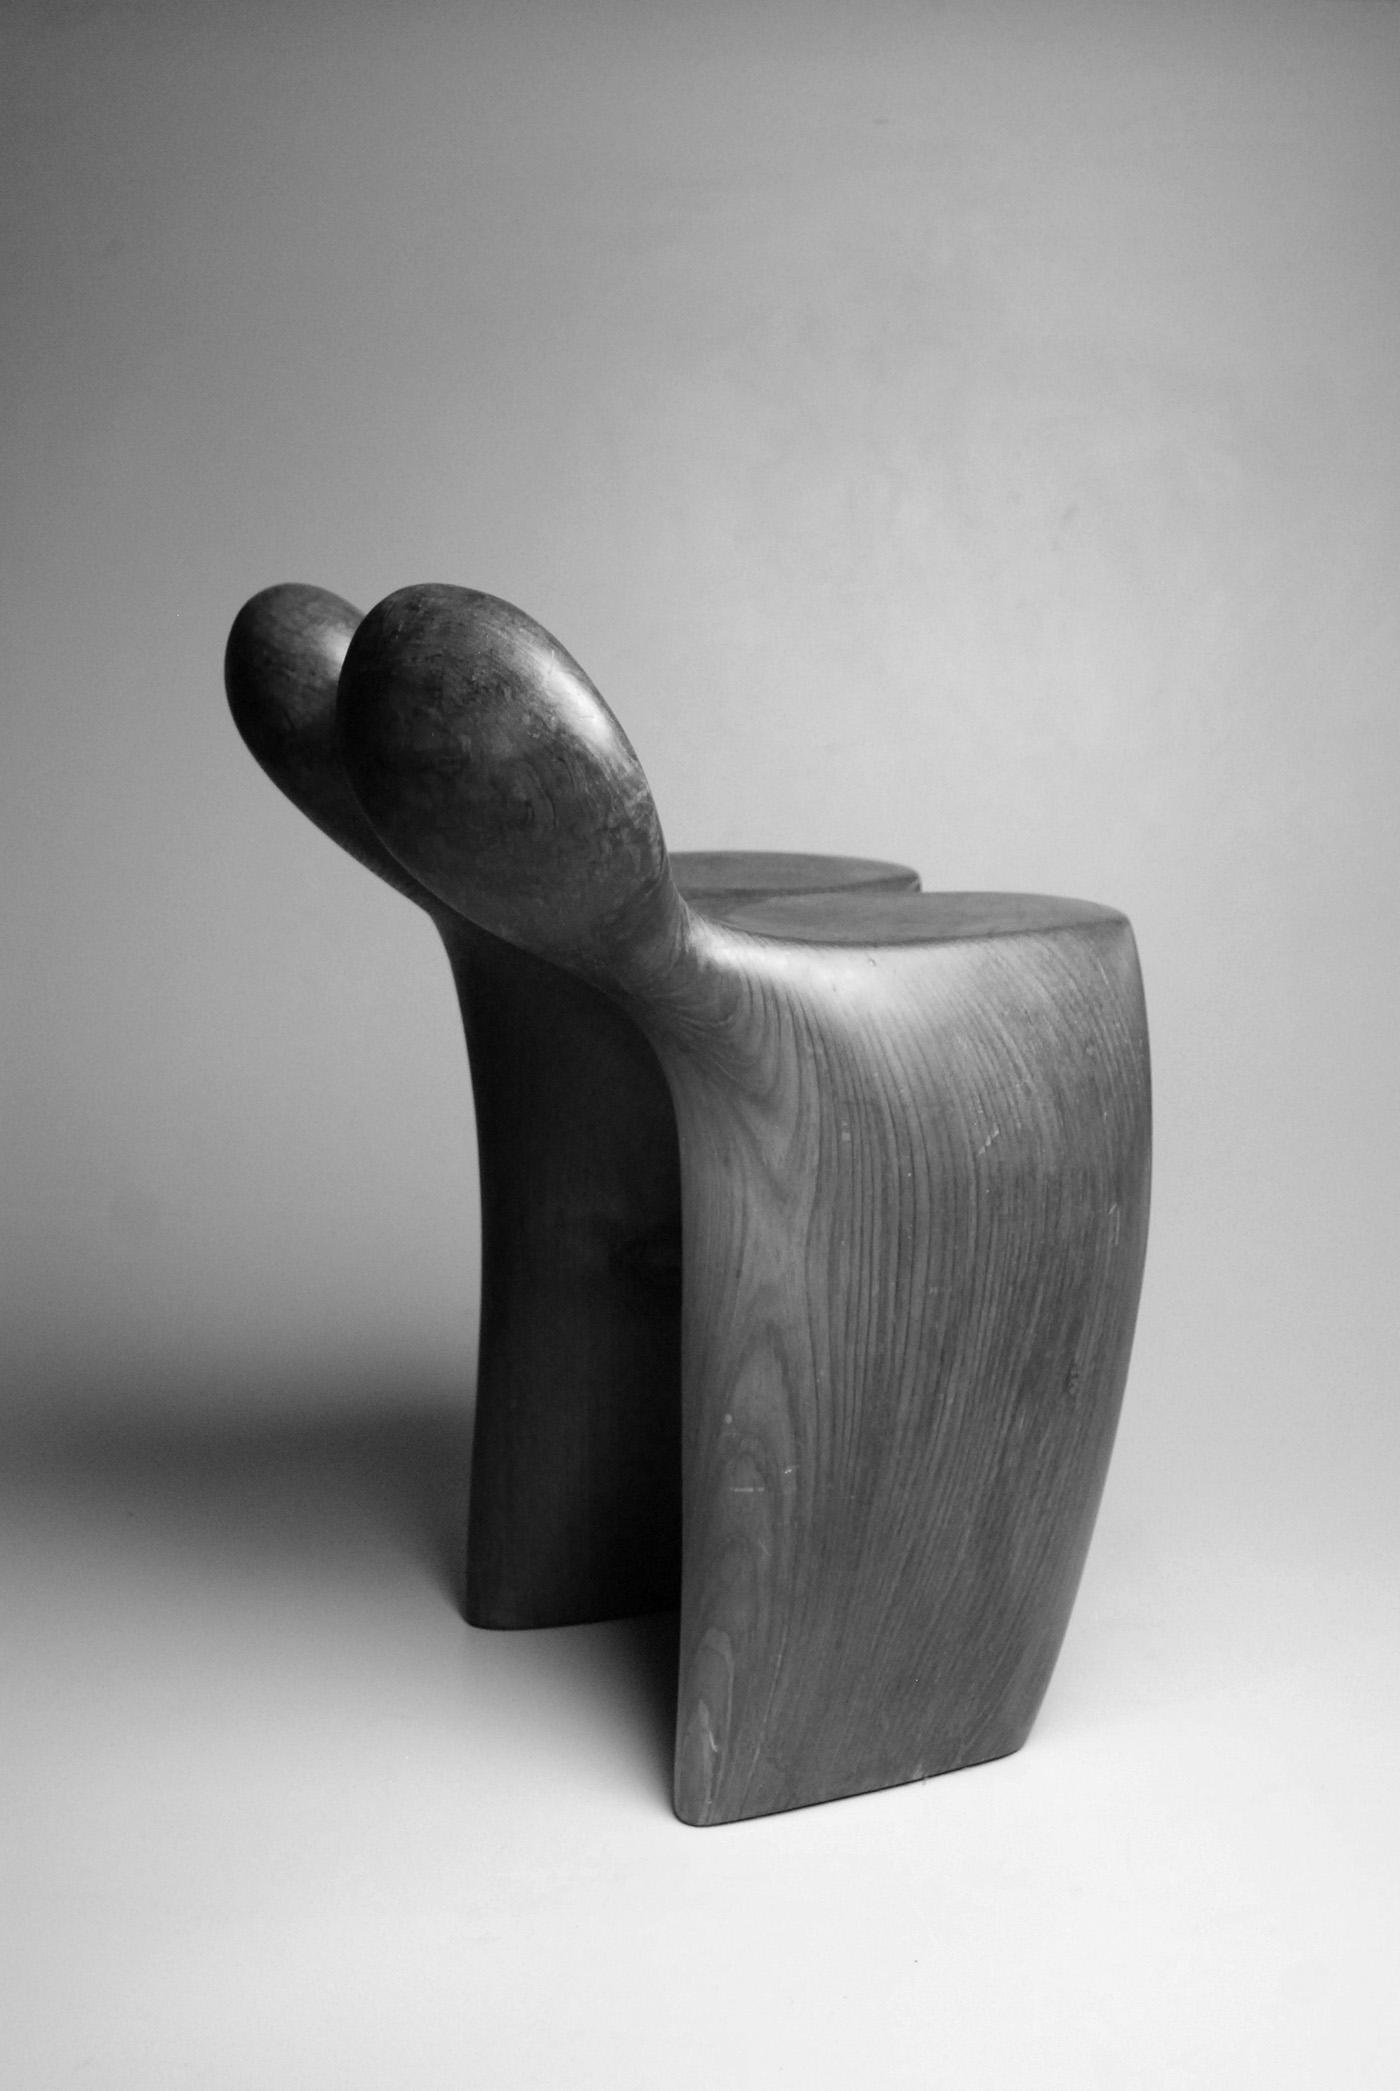 Untitled , 1980  Redwood  23 1/2 x 17 x 16 1/2 inches  59.69 x 43.18 x 41.91 cm